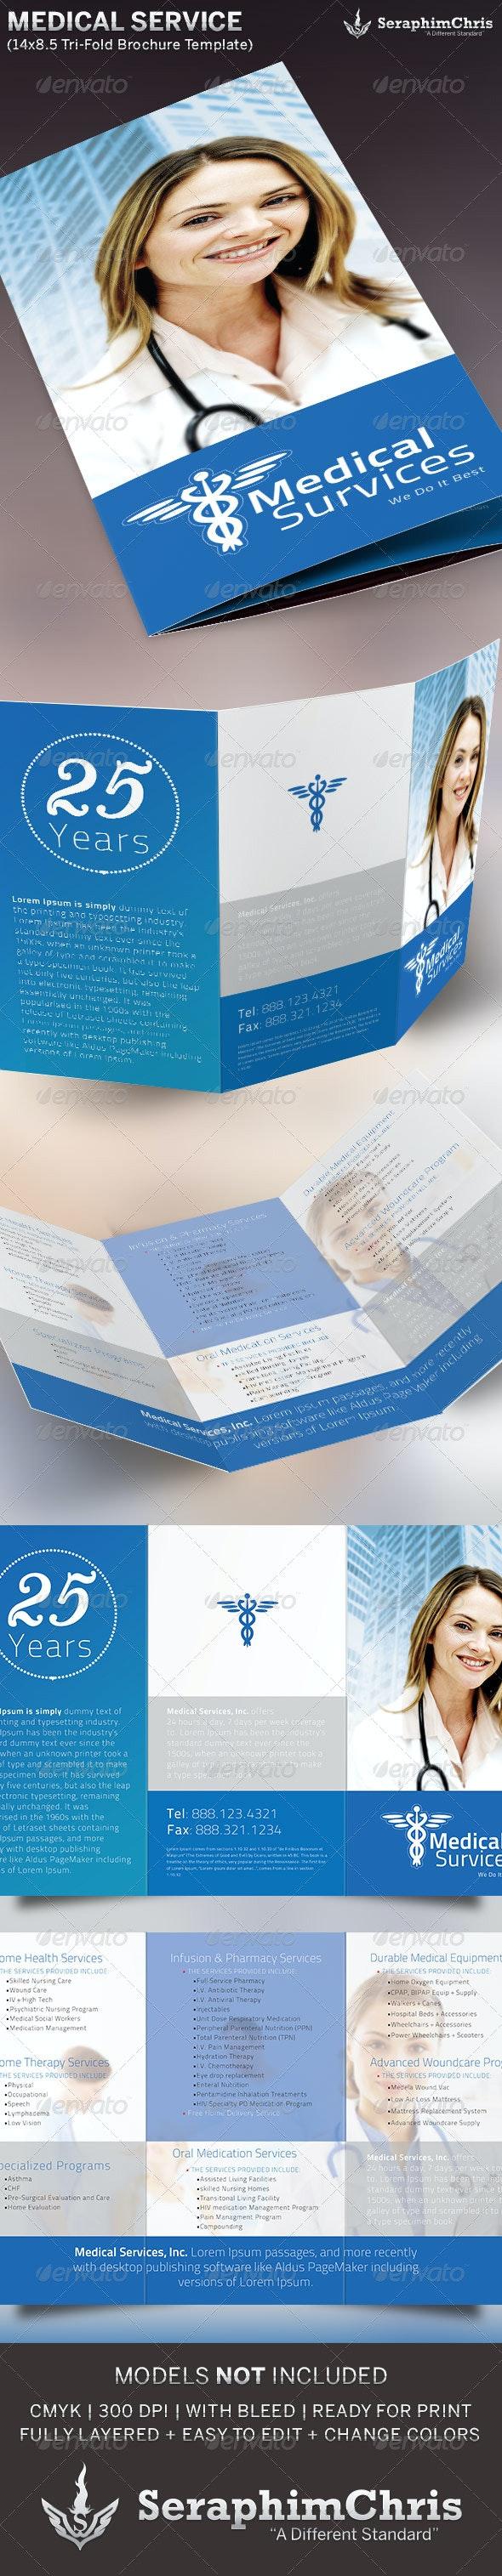 Medical Service Tri-Fold Brochure Template - Informational Brochures